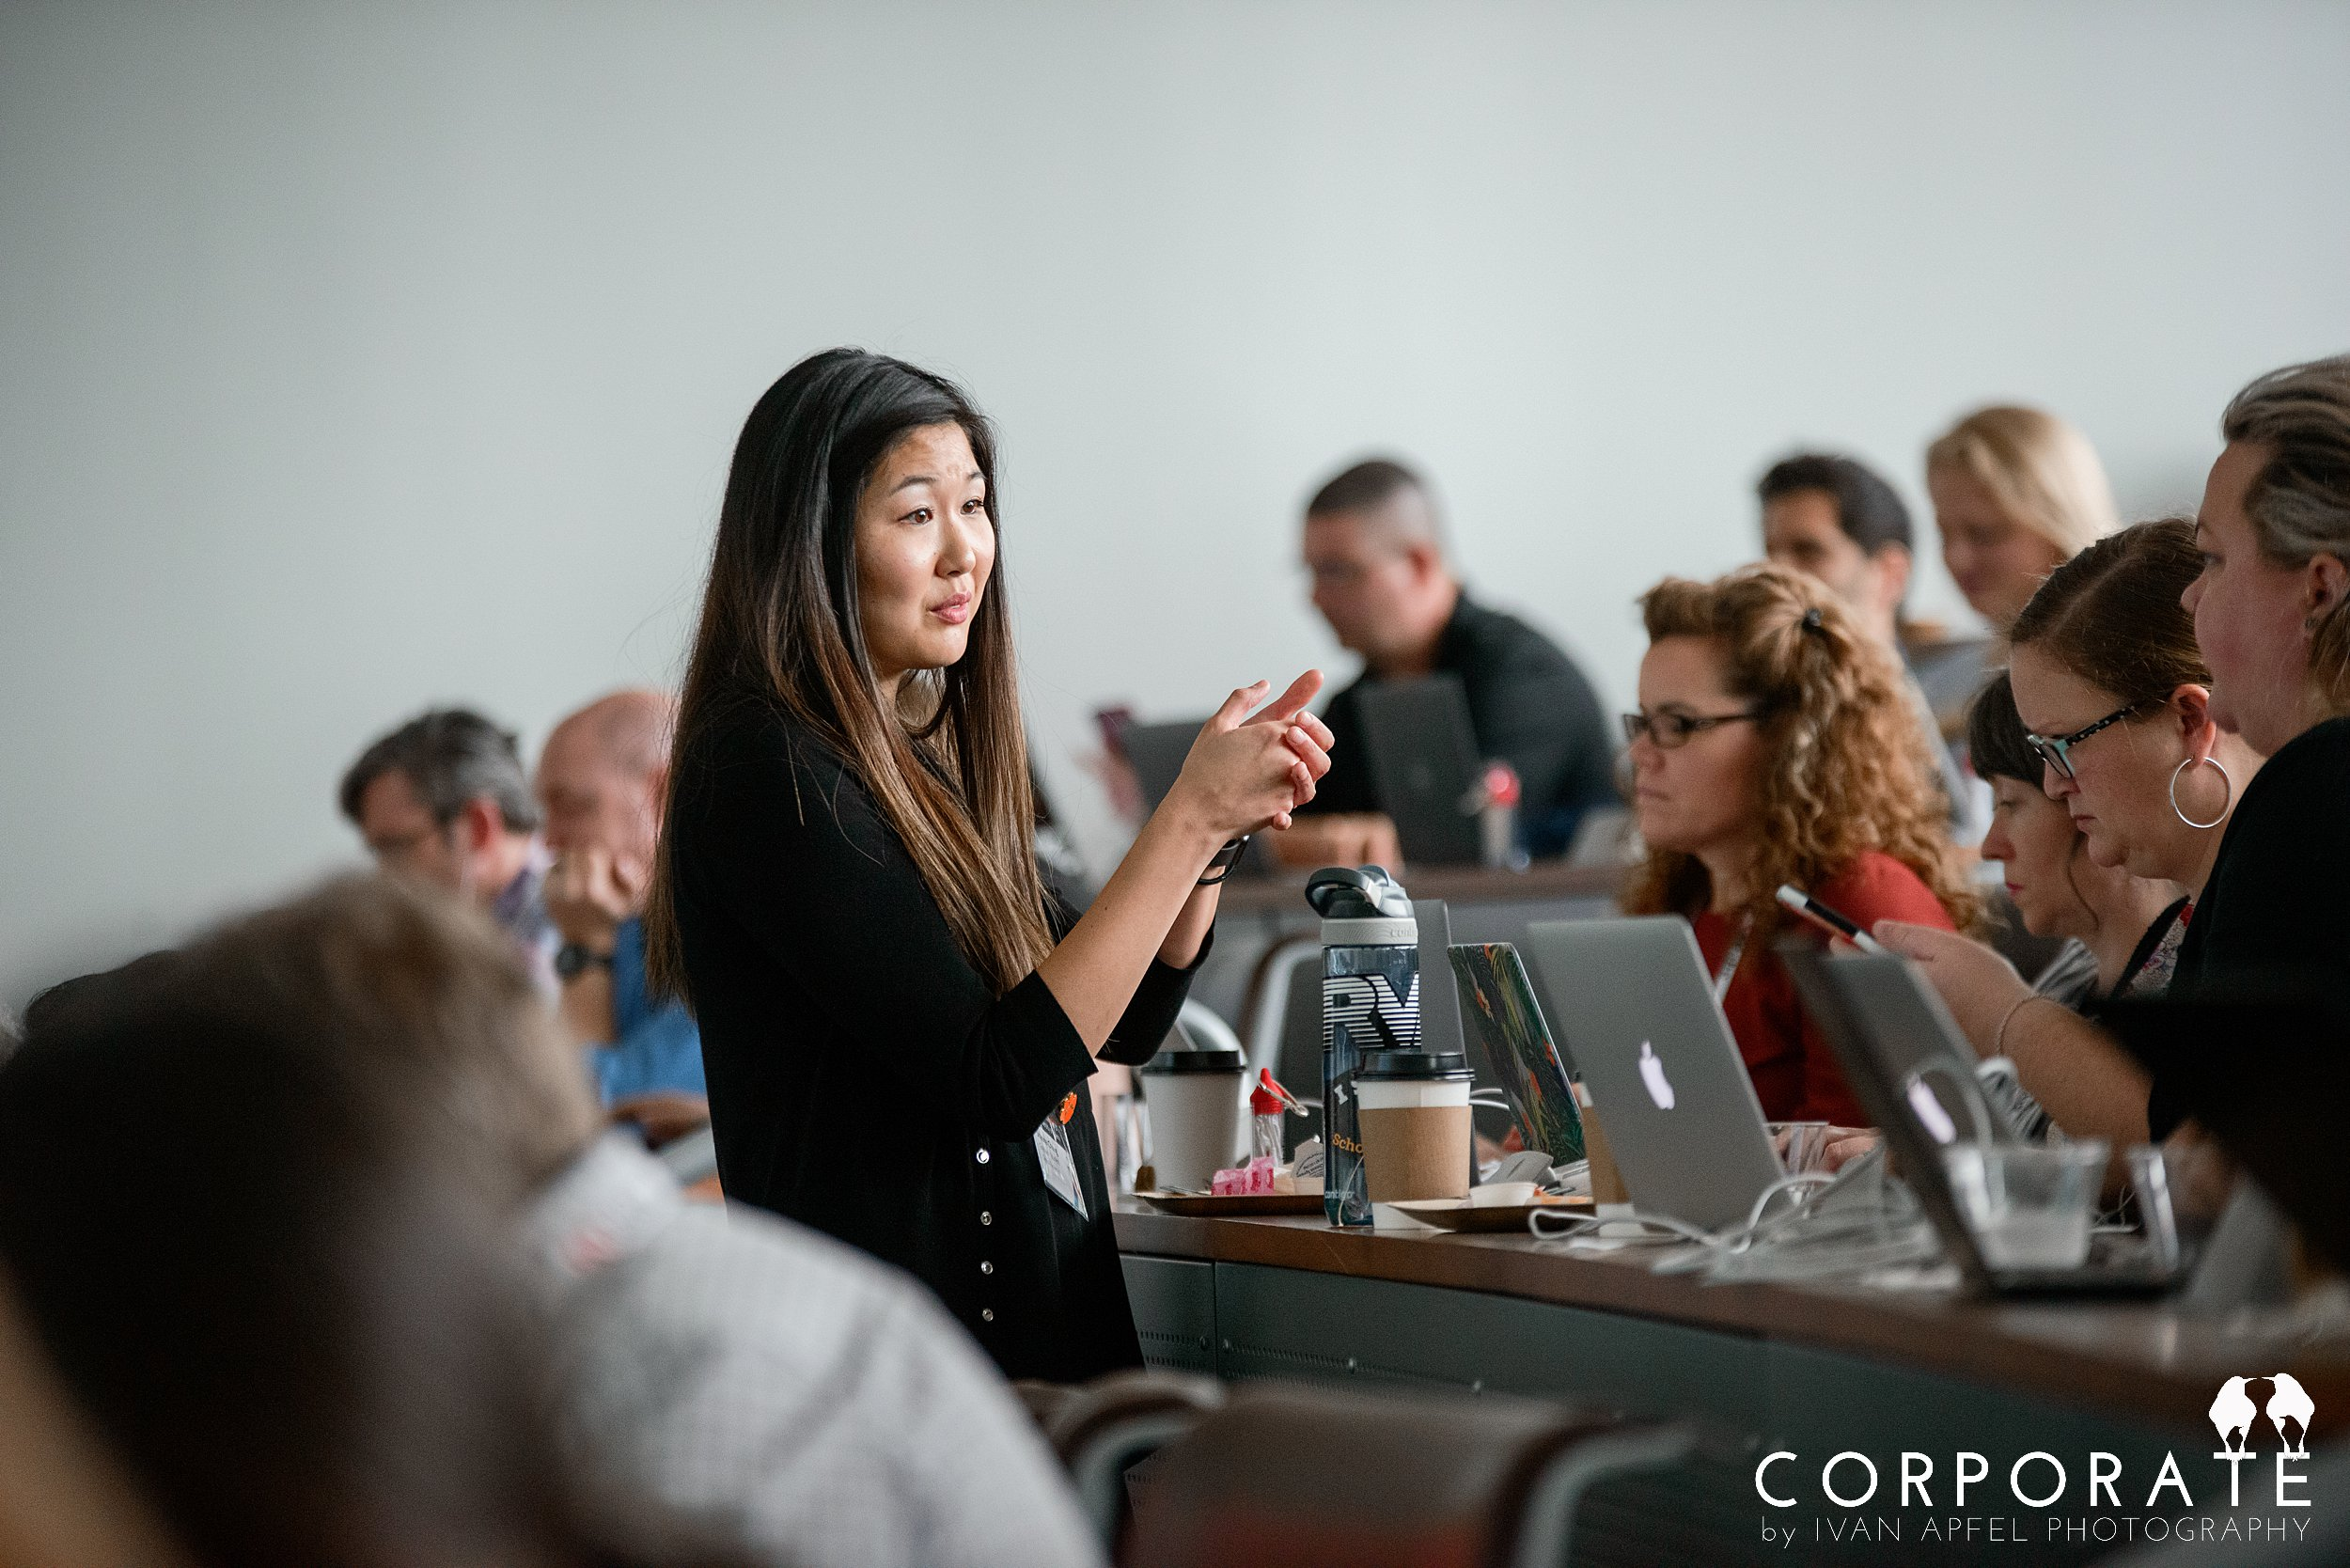 Miami Corporate Event Photographer Adobe Systems Creative Campus 2019-D3_Adobe_Creative_Campus_UMiami-_IAP0520.jpg